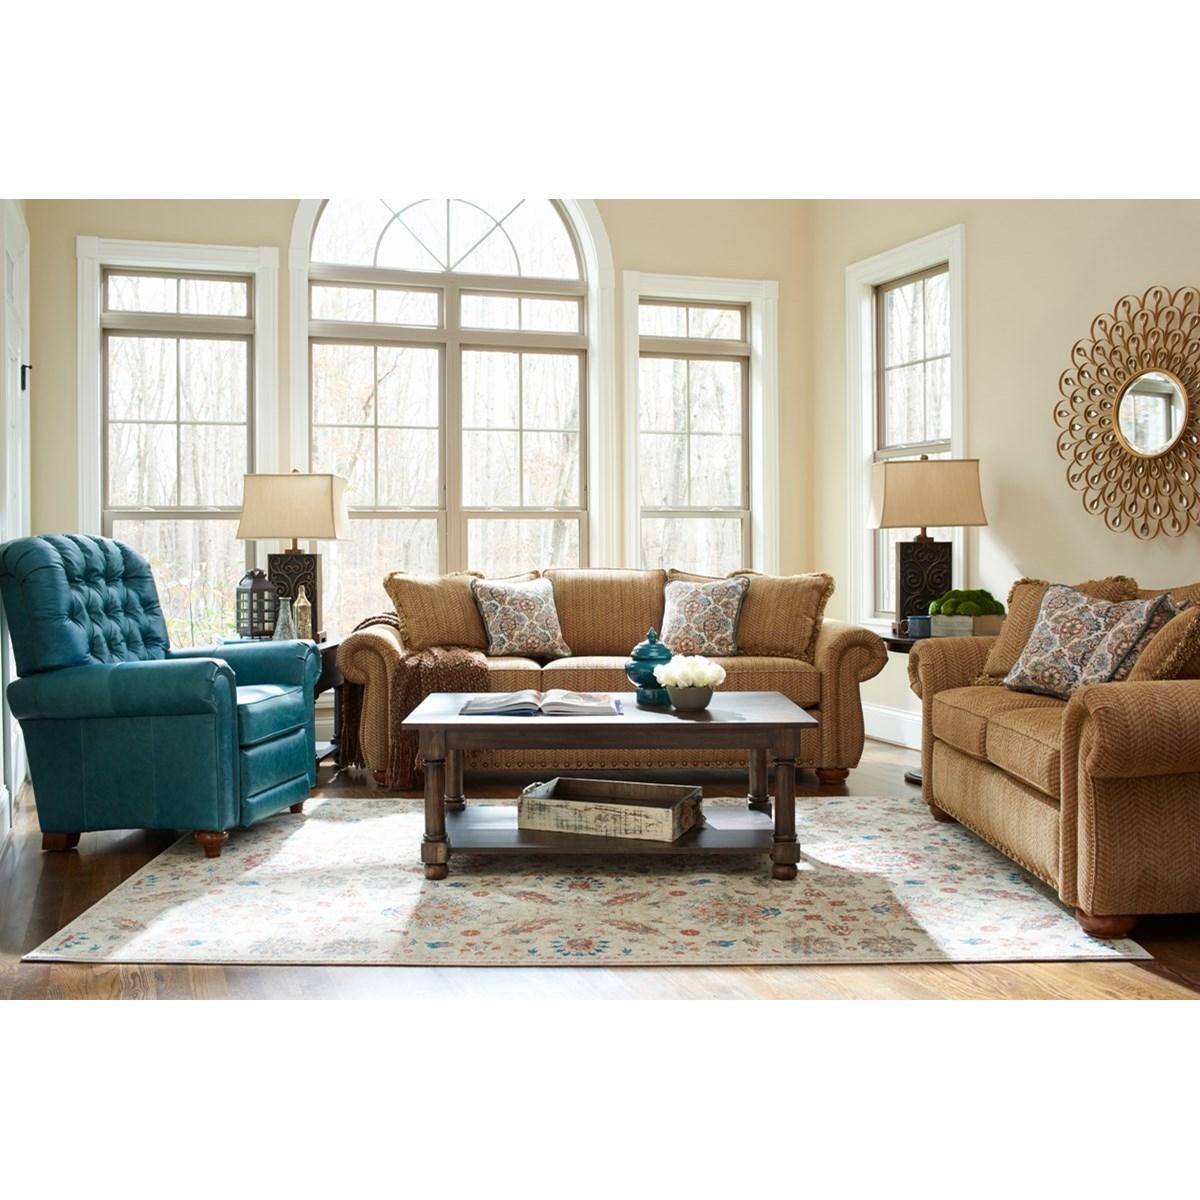 La z boy wales living room group zak 39 s fine furniture for La z boy living room set